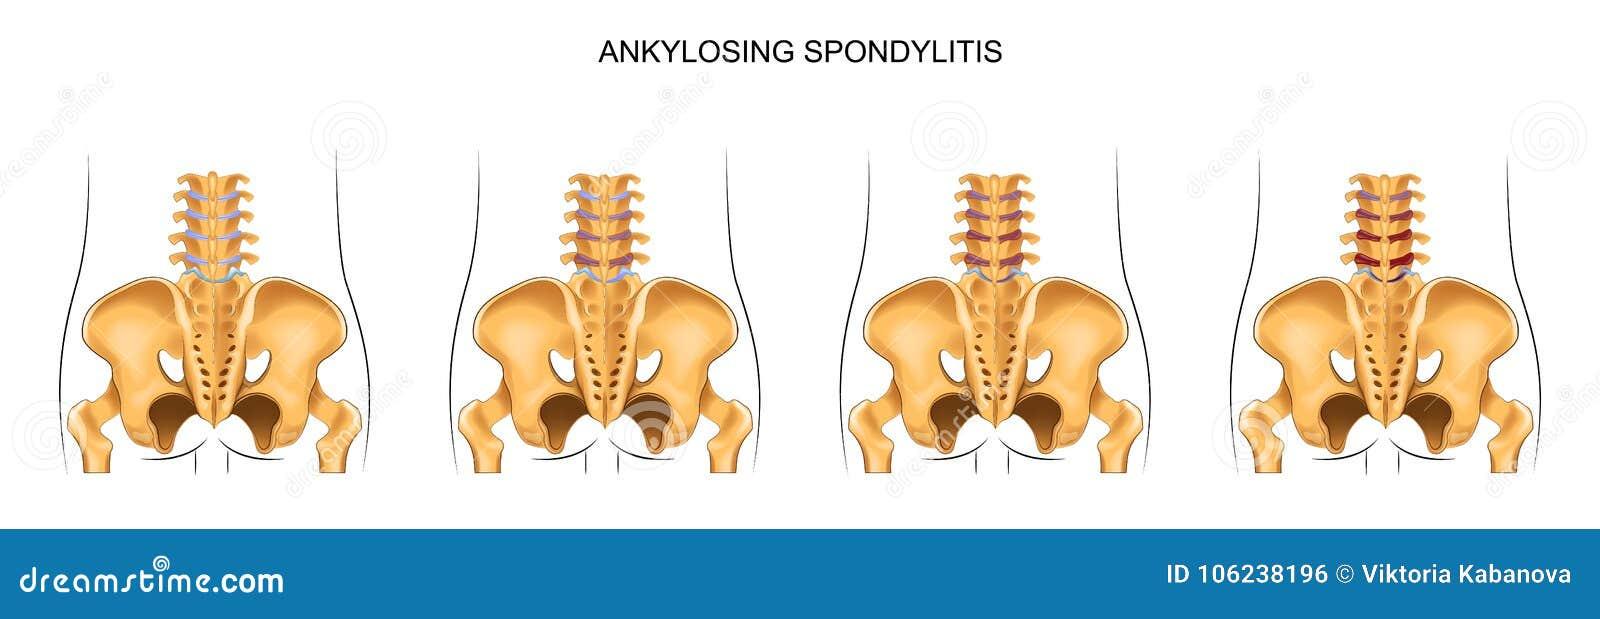 The Development Of Ankylosing Spondylitis In The Lumbar Spine Stock